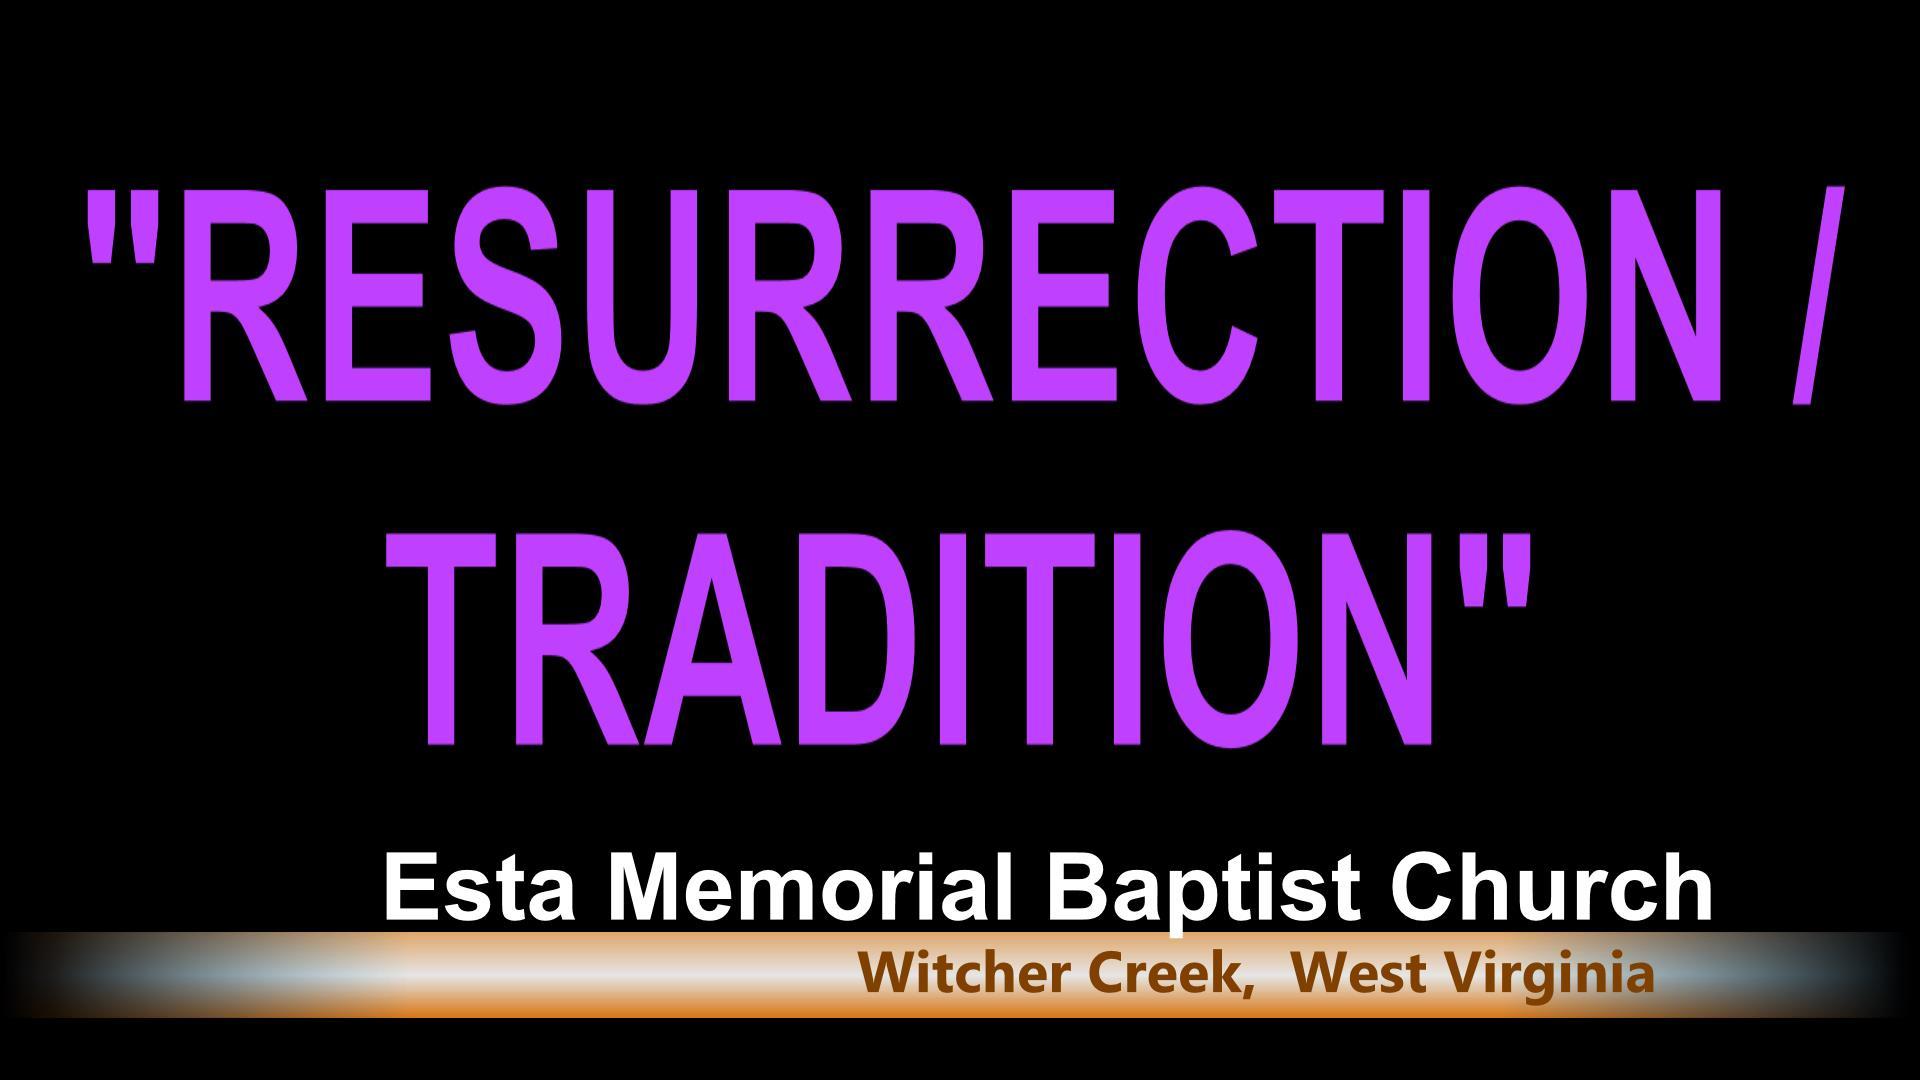 RESURRECTION / TRADITION